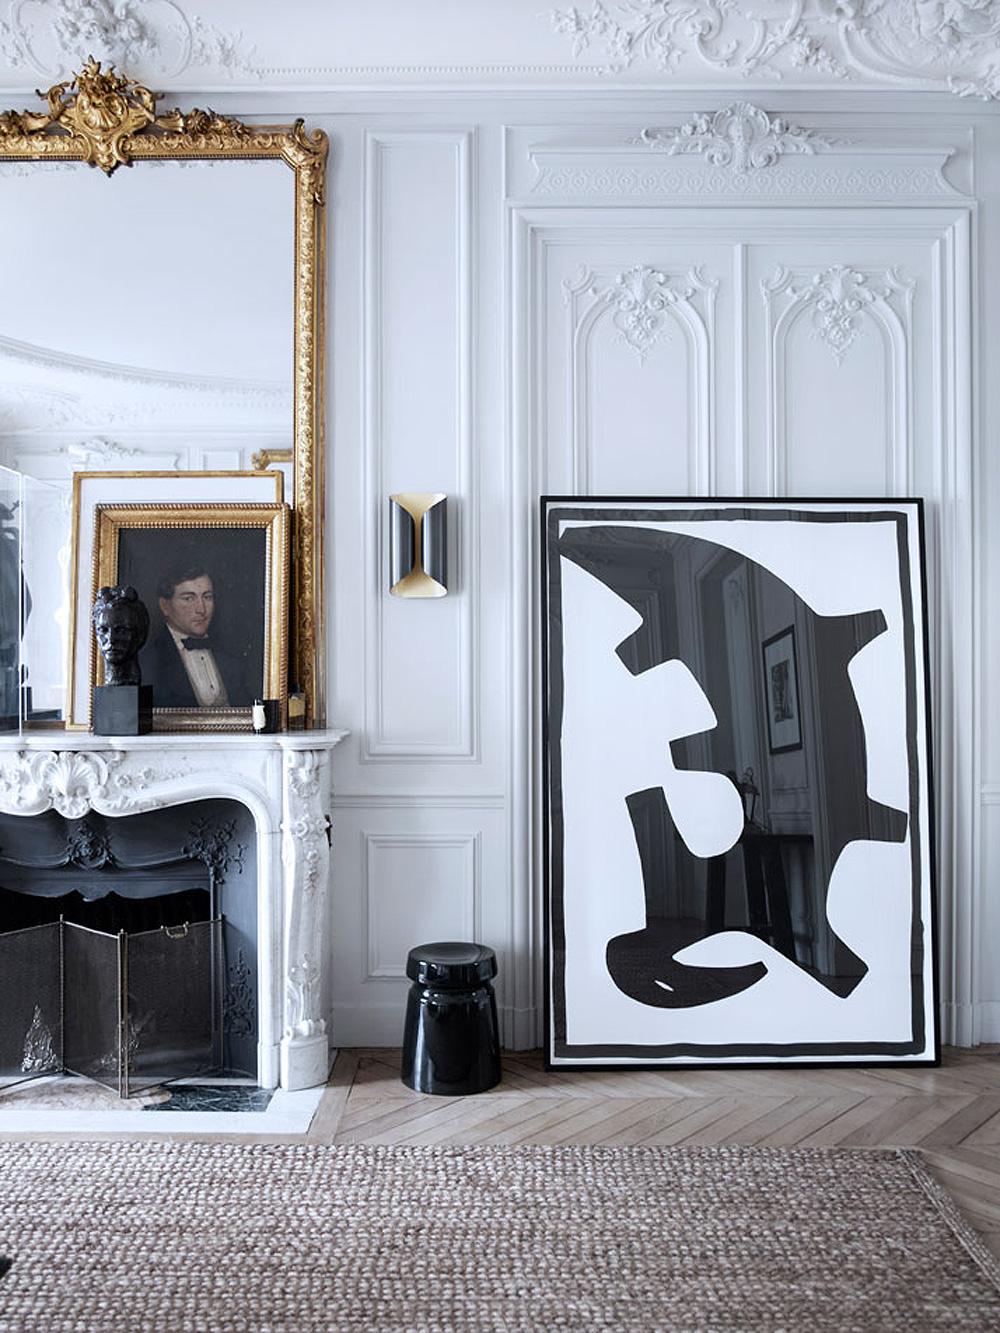 Paris-Apartment-Tour-Art-9.jpg